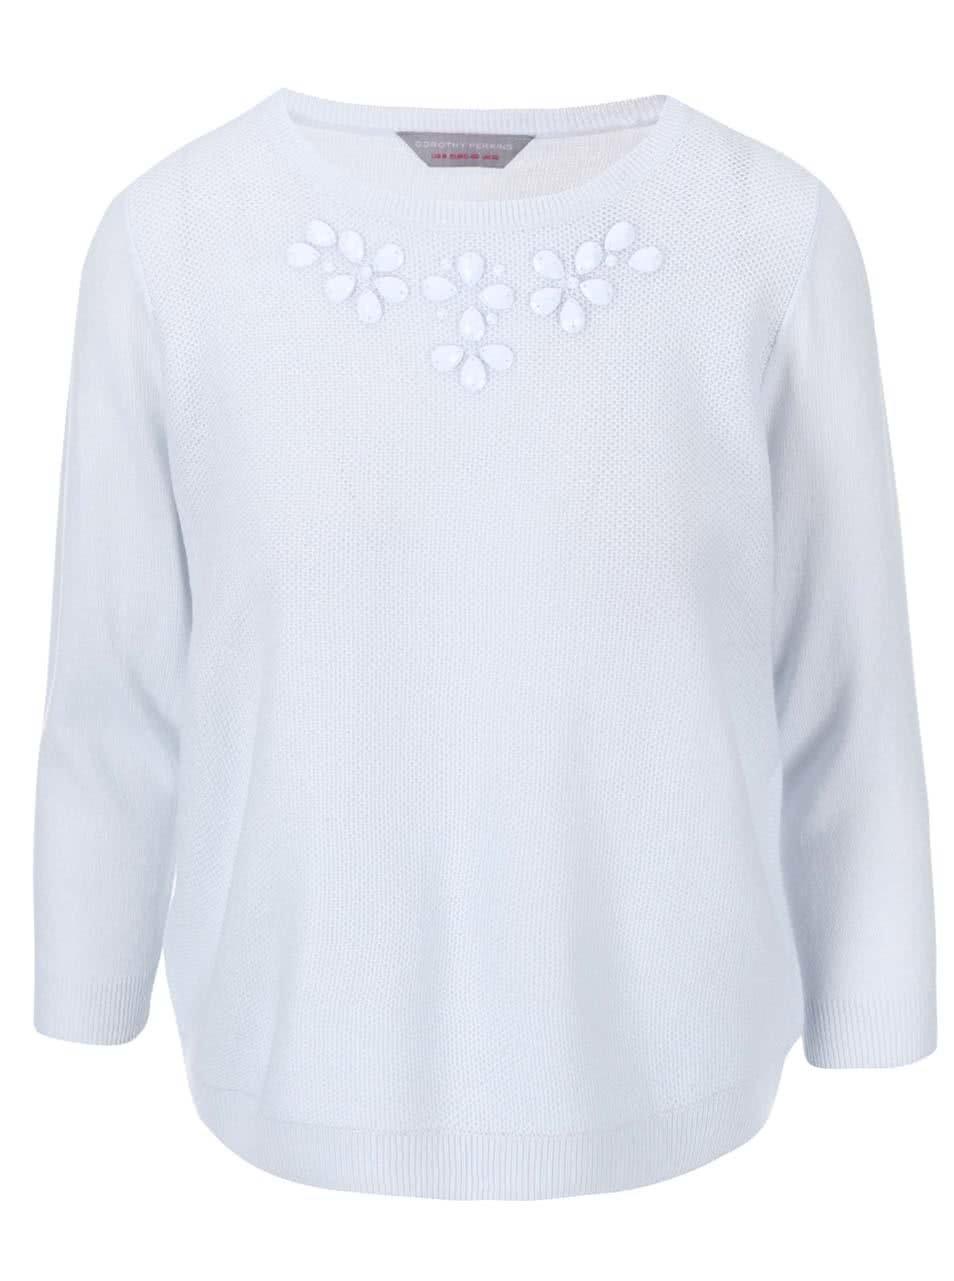 Světle modrý svetr s korálky u výstřihu Dorothy Perkins 25be9c4cea